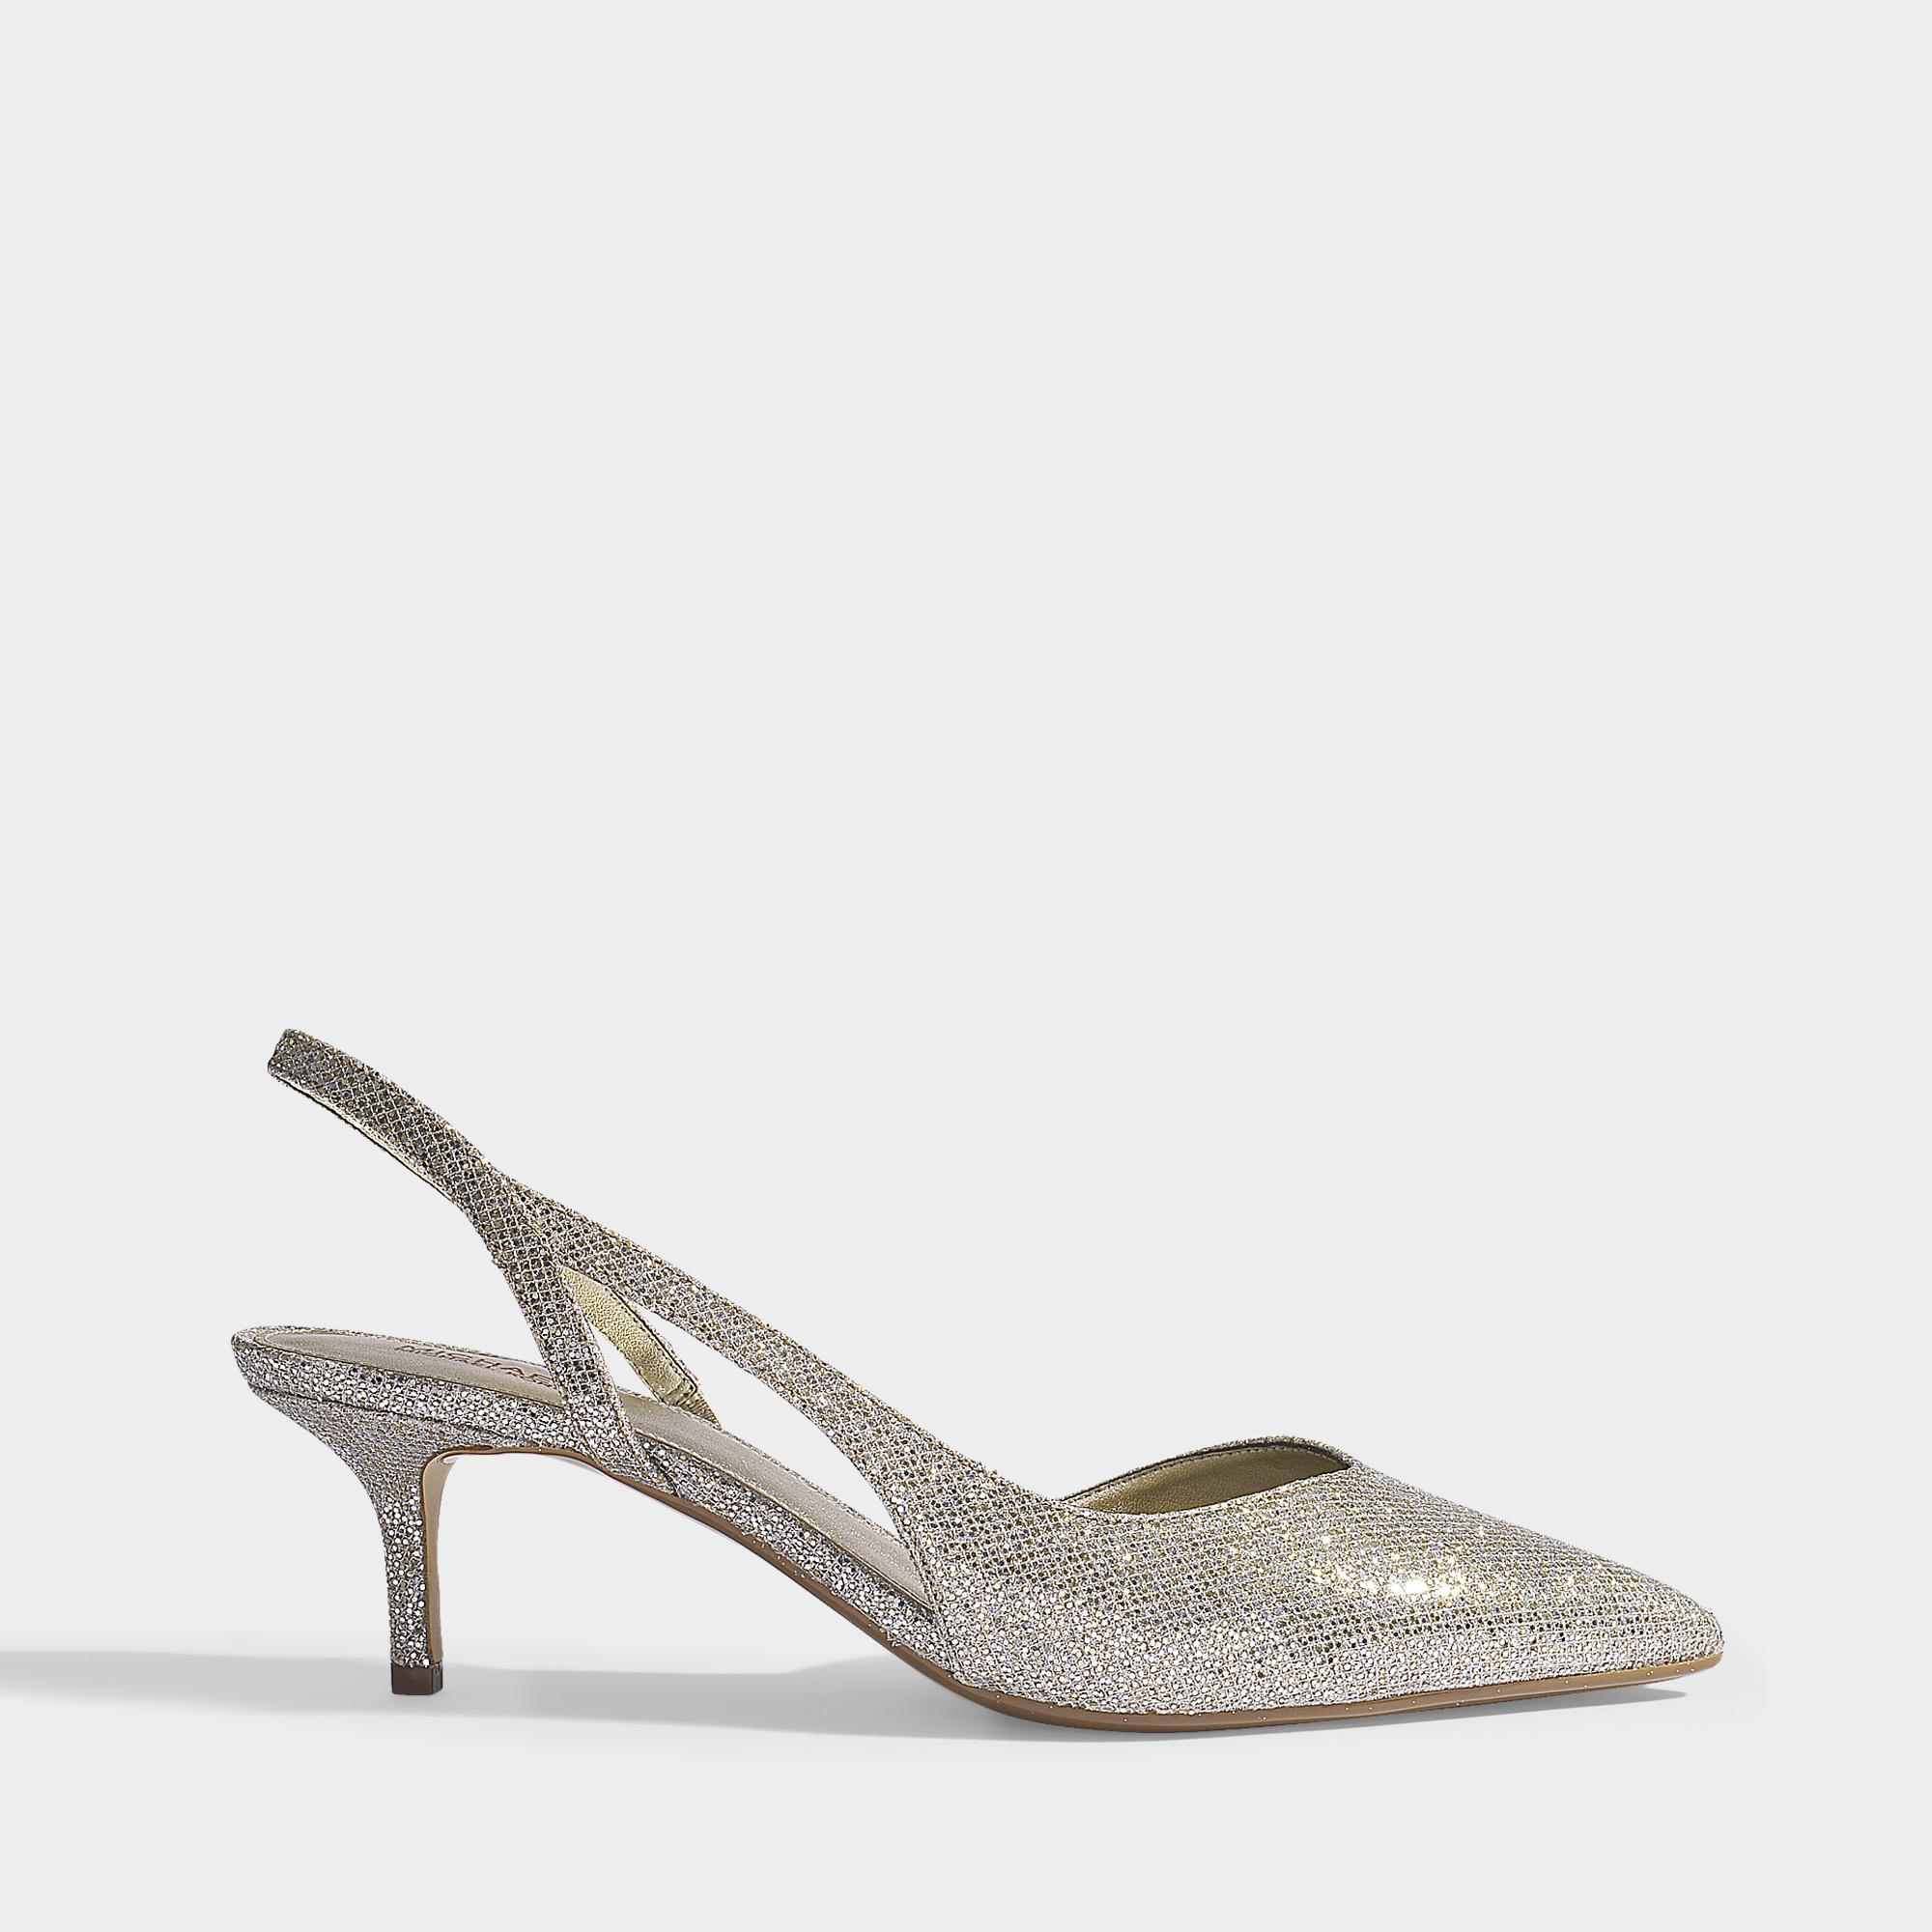 804d7dc2f4d Lyst - MICHAEL Michael Kors Eliza Kitten Pumps In Champagne Glitter ...